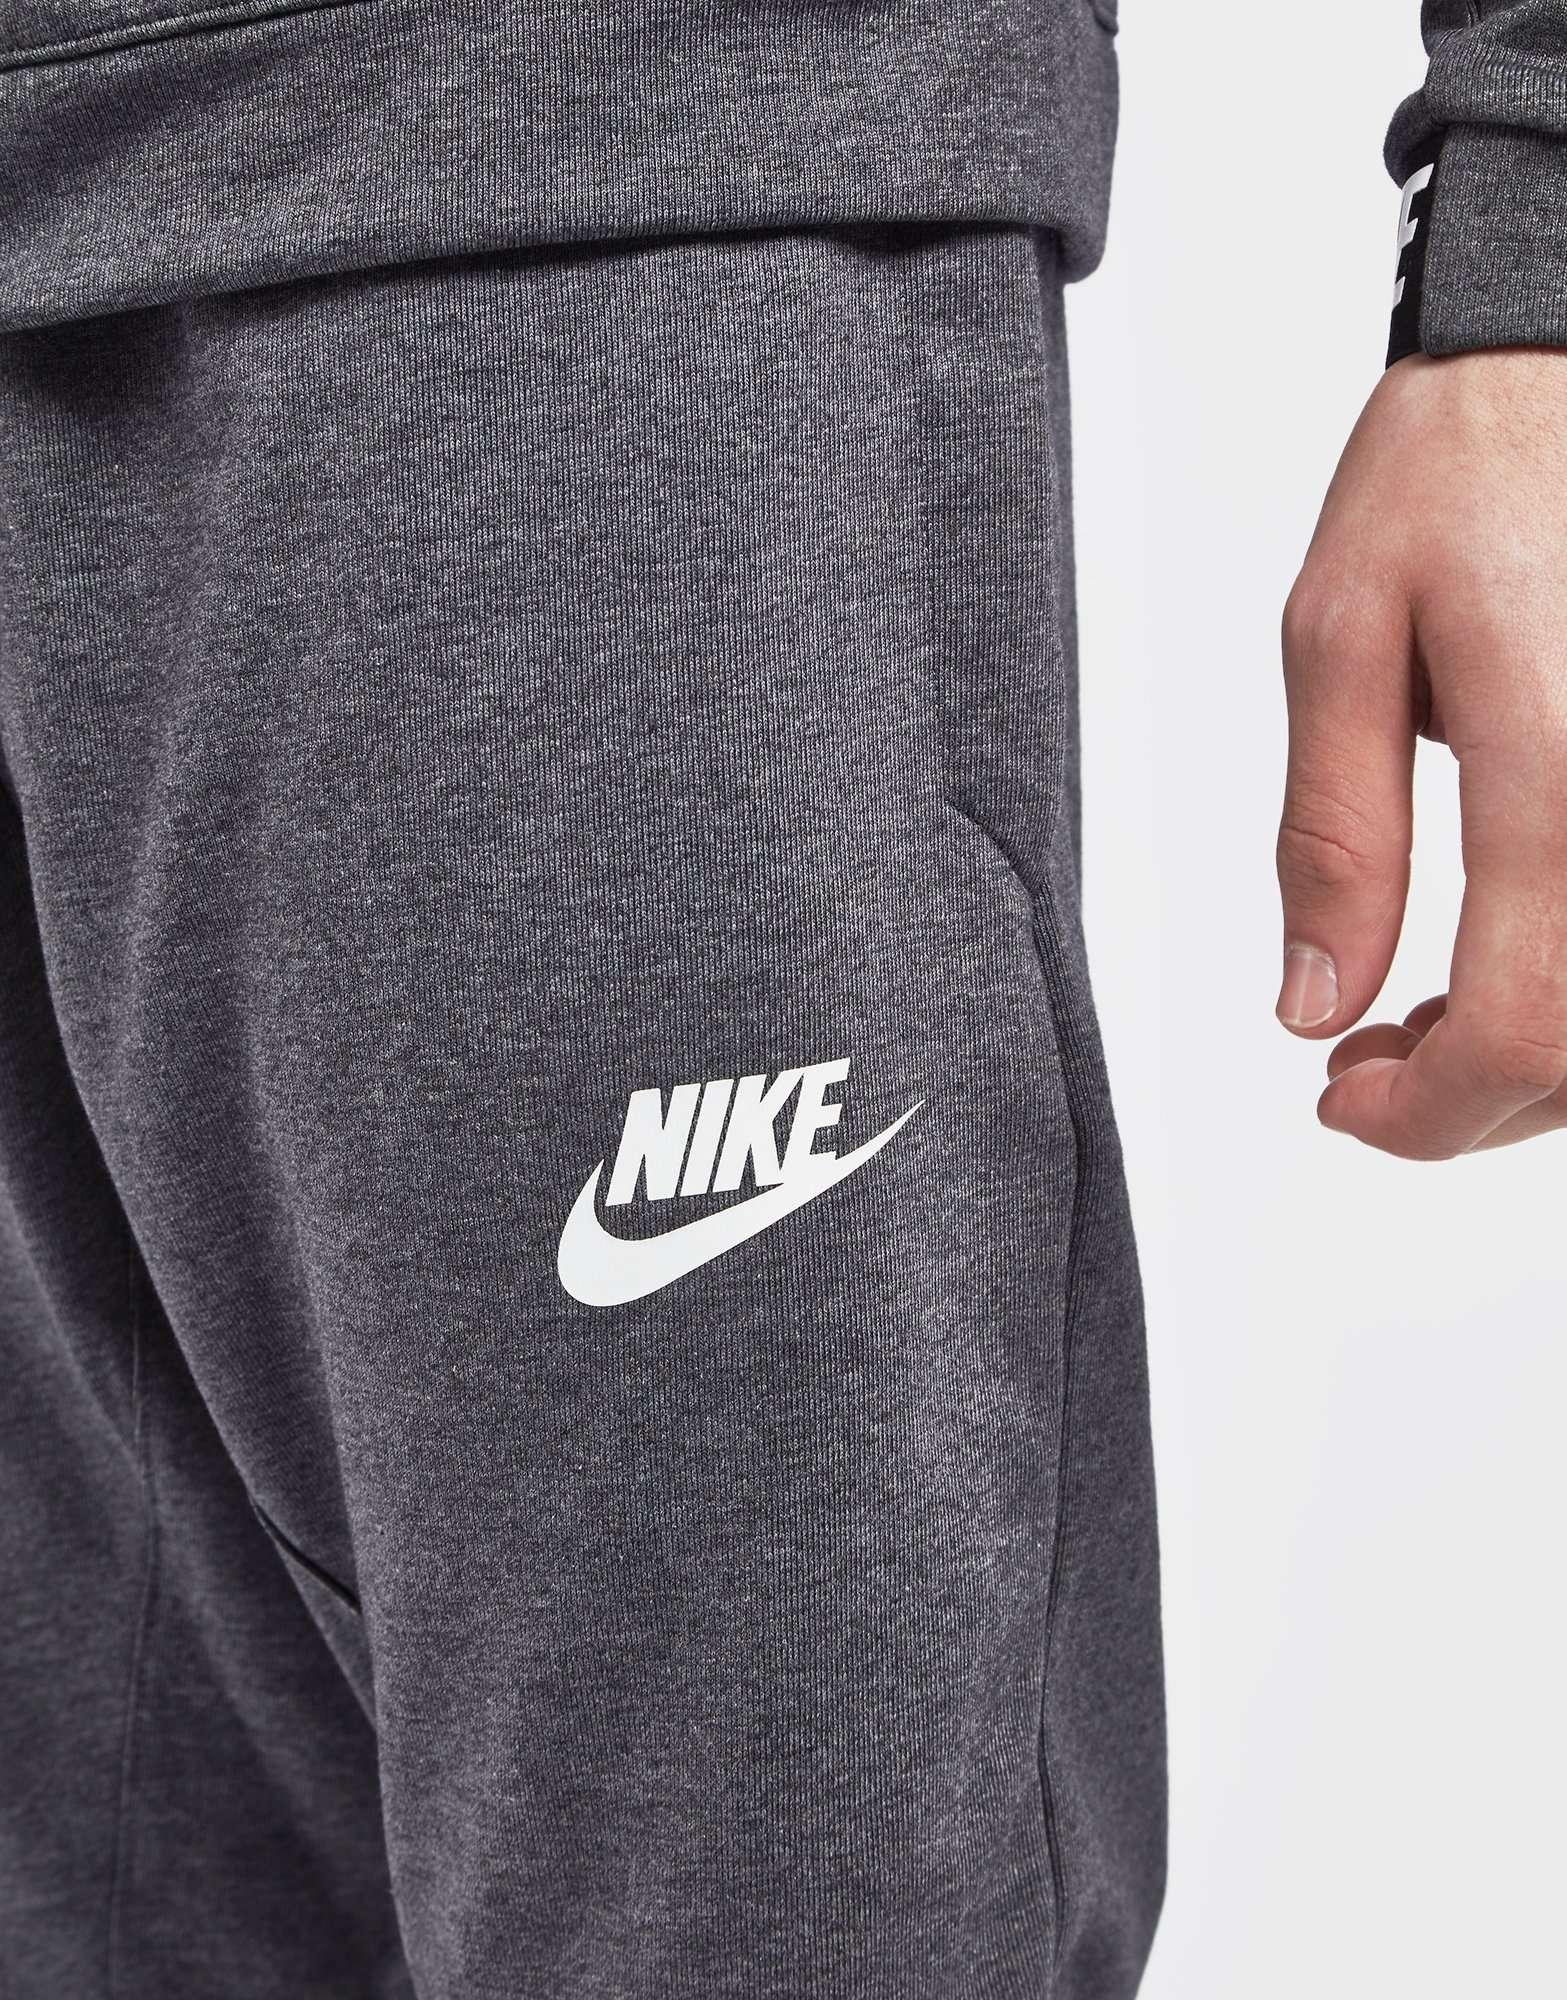 Nike Advance Fleece Pants